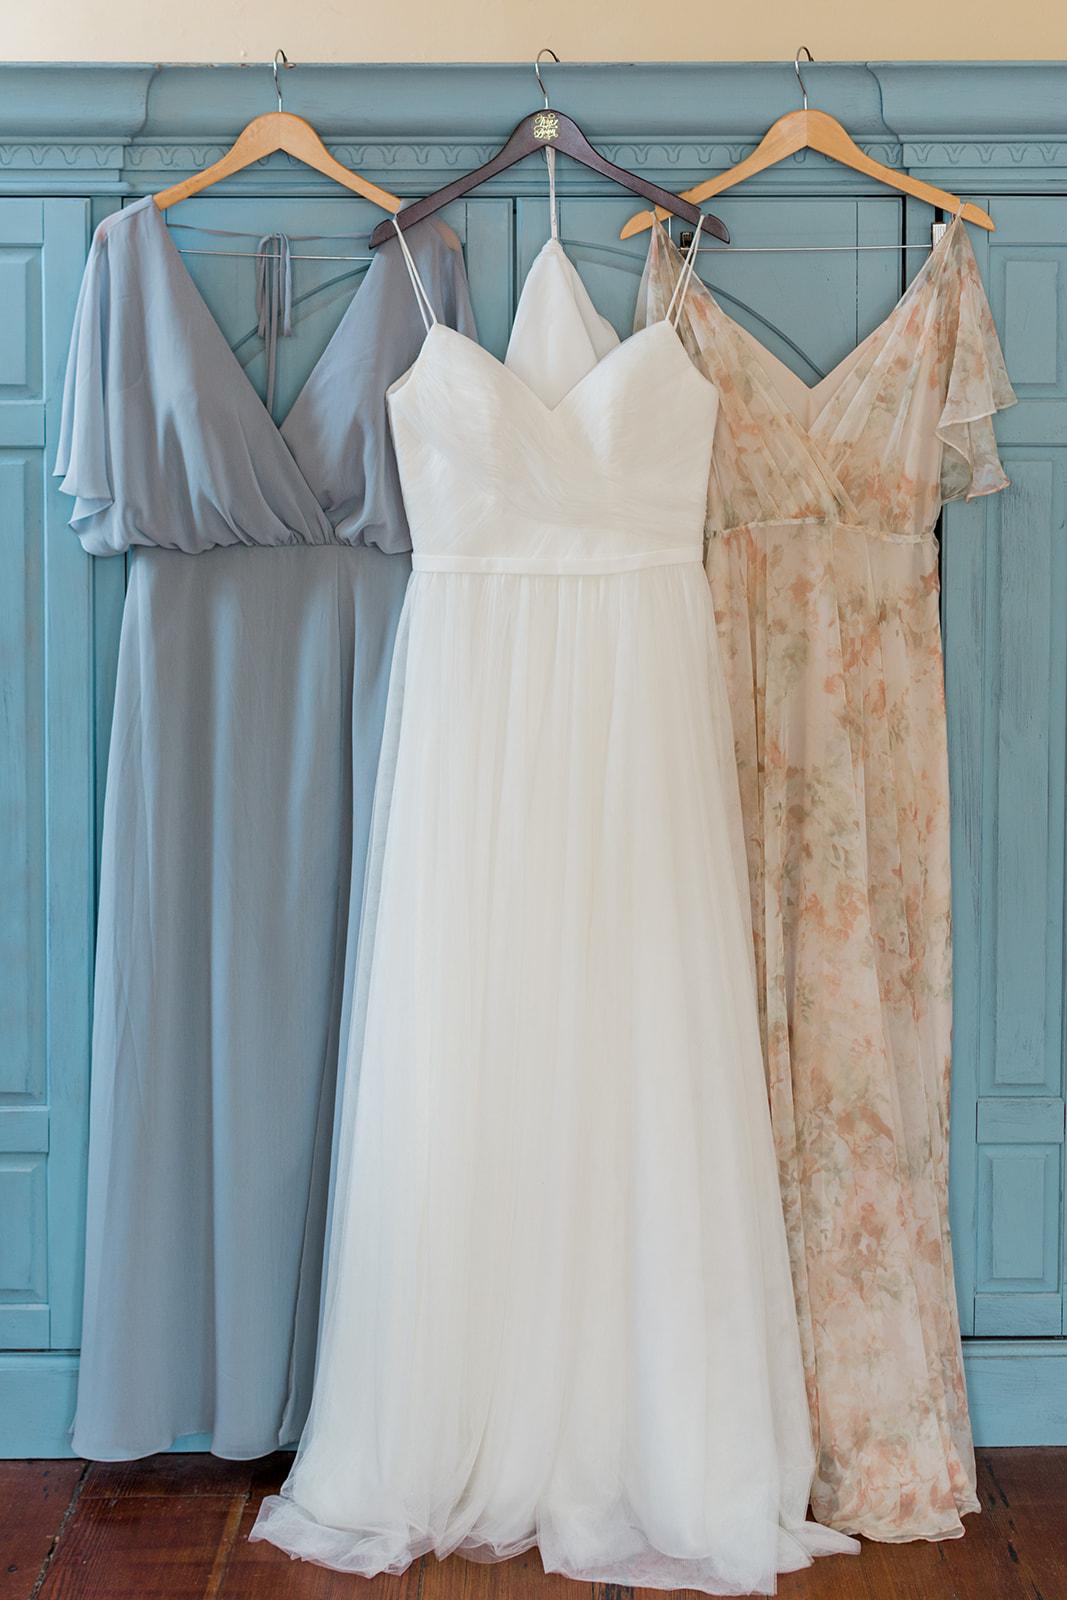 savannah-bridal-shop-ivory-and-beau-savannah-wedding-dresses-rebecca-ingram-wedding-dress-jenny-yoo-floral-print-bridesmaid-dress-charleston-styled-shoot-romantic-wedding-dresses.jpg